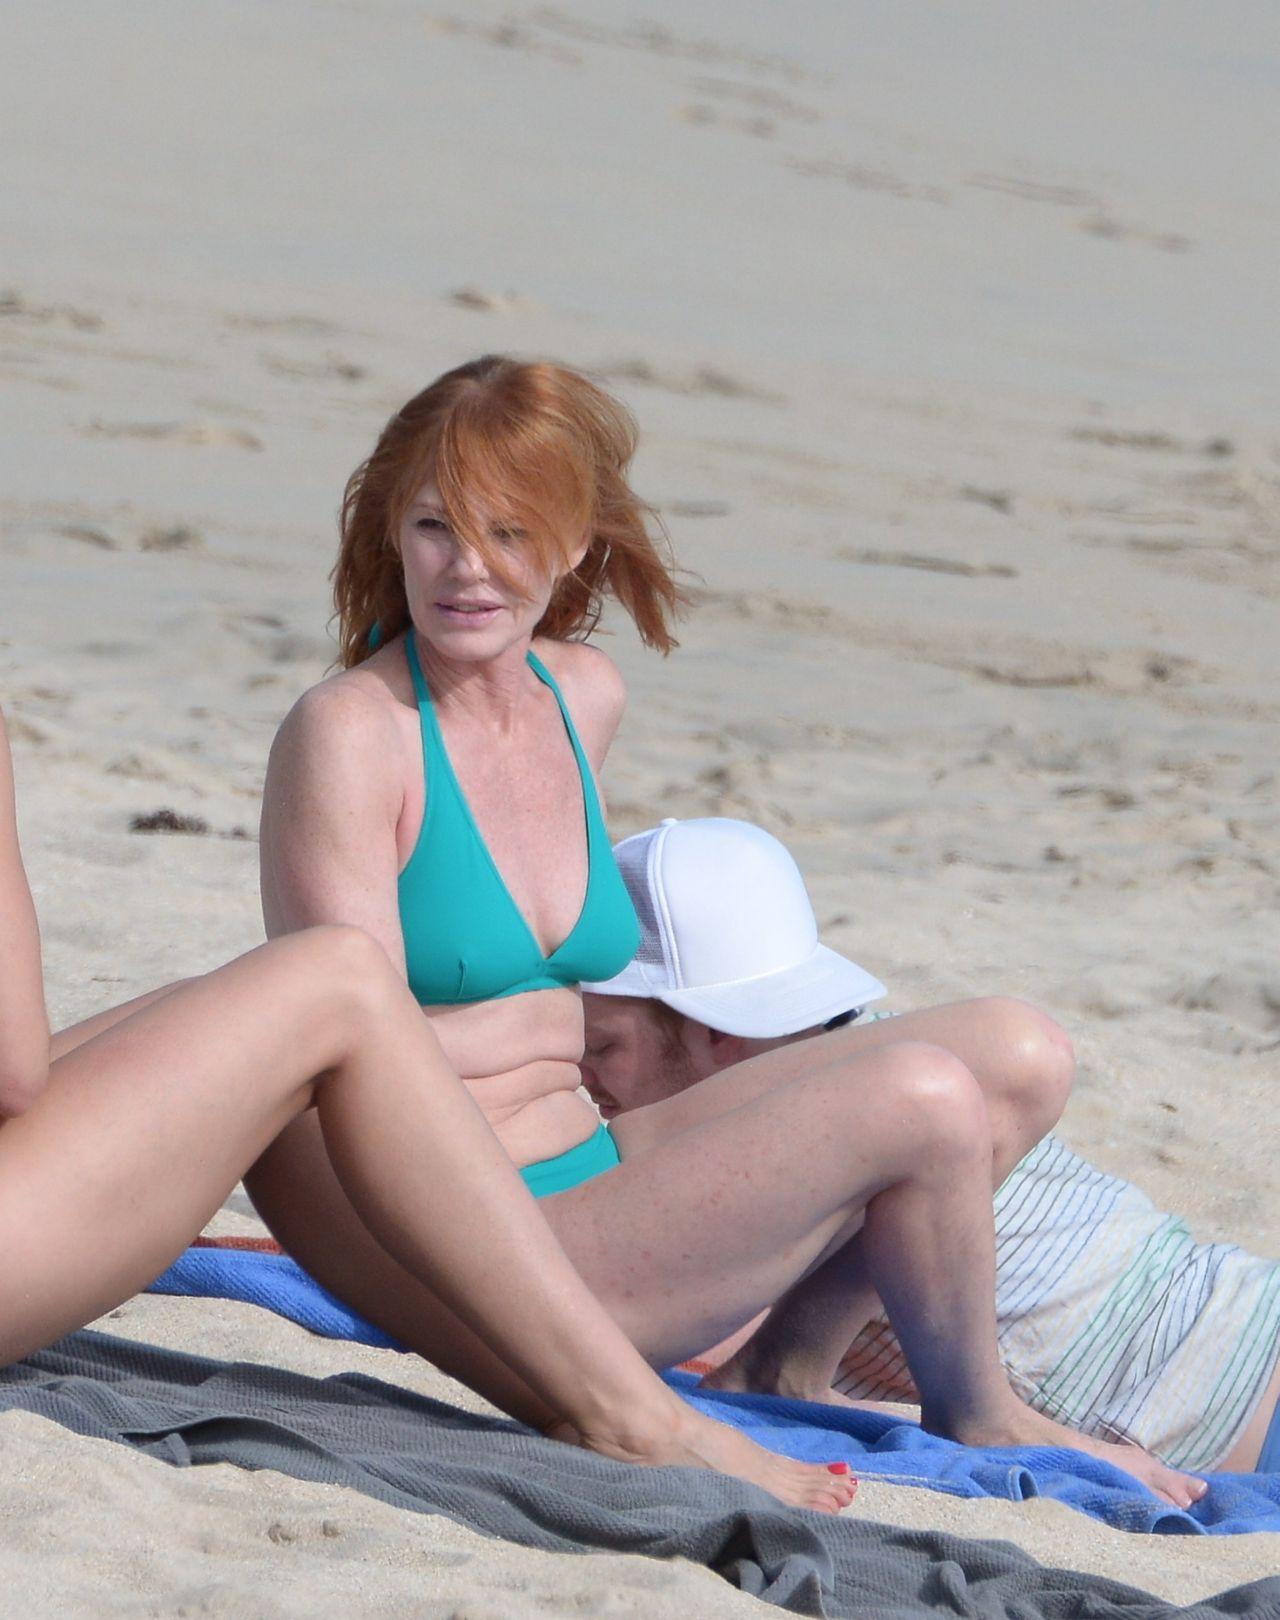 Marg Helgenberger Bikini Candids St Barts December 2013